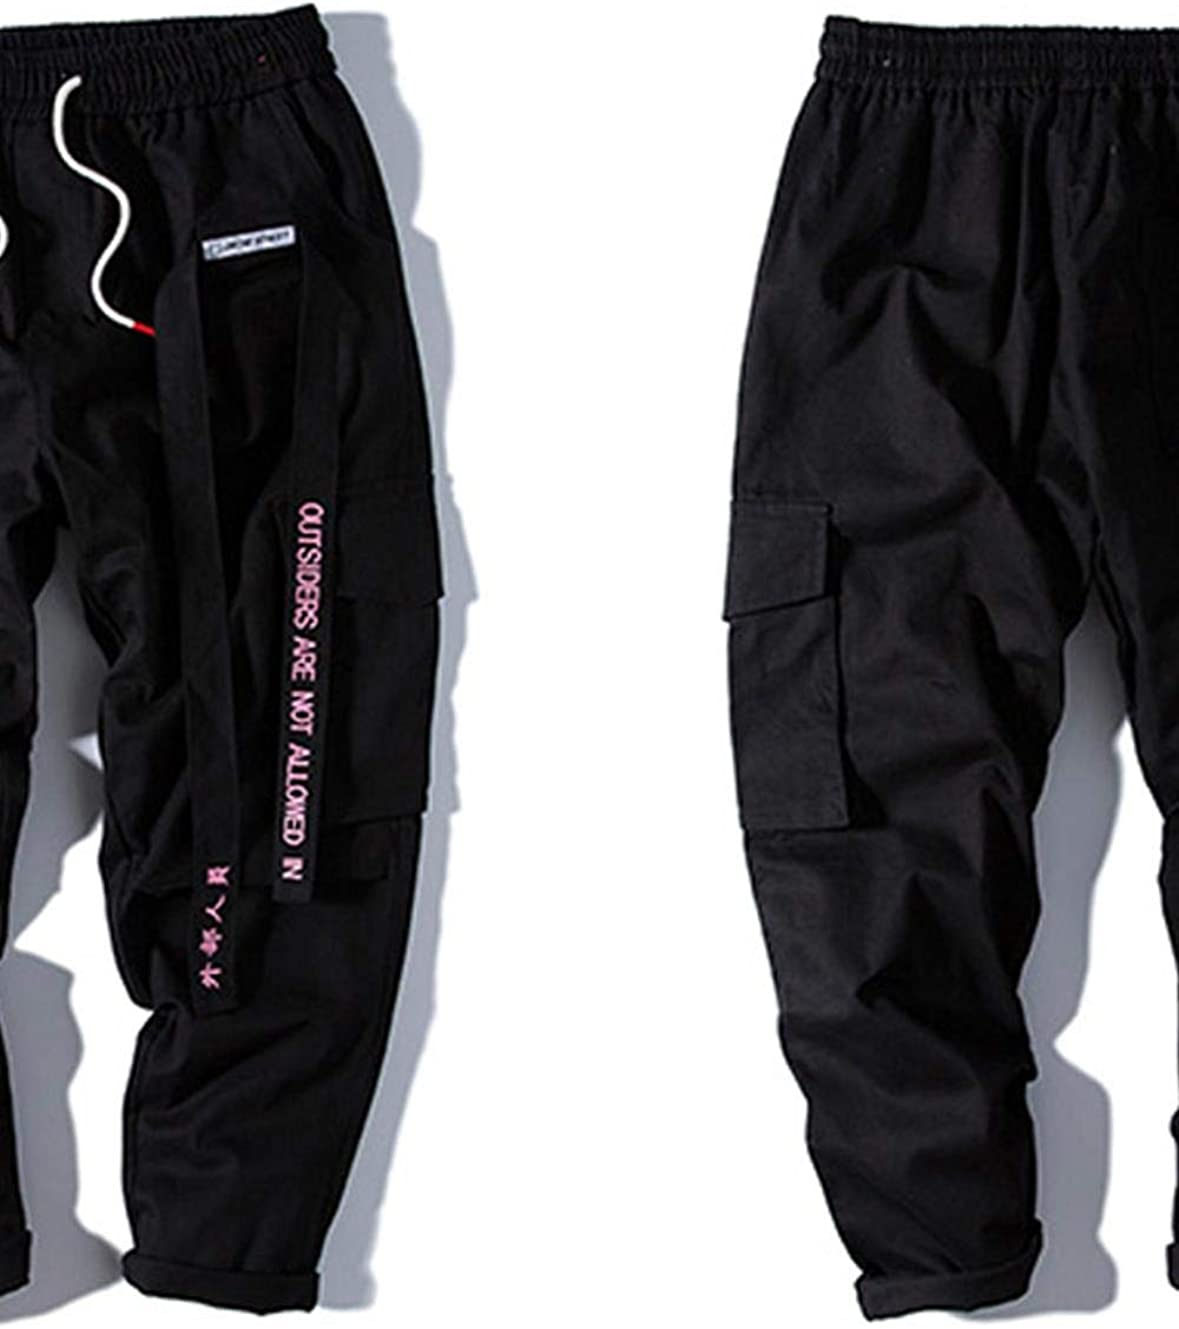 Tasty Life Pantaloni Jogging Hip-Hop da Uomo Pantaloni Harlan Street Abbigliamento Nastro Lettere Ricamate Pantaloni Casual Popolari Tute Nere Rosa Moda Casual.